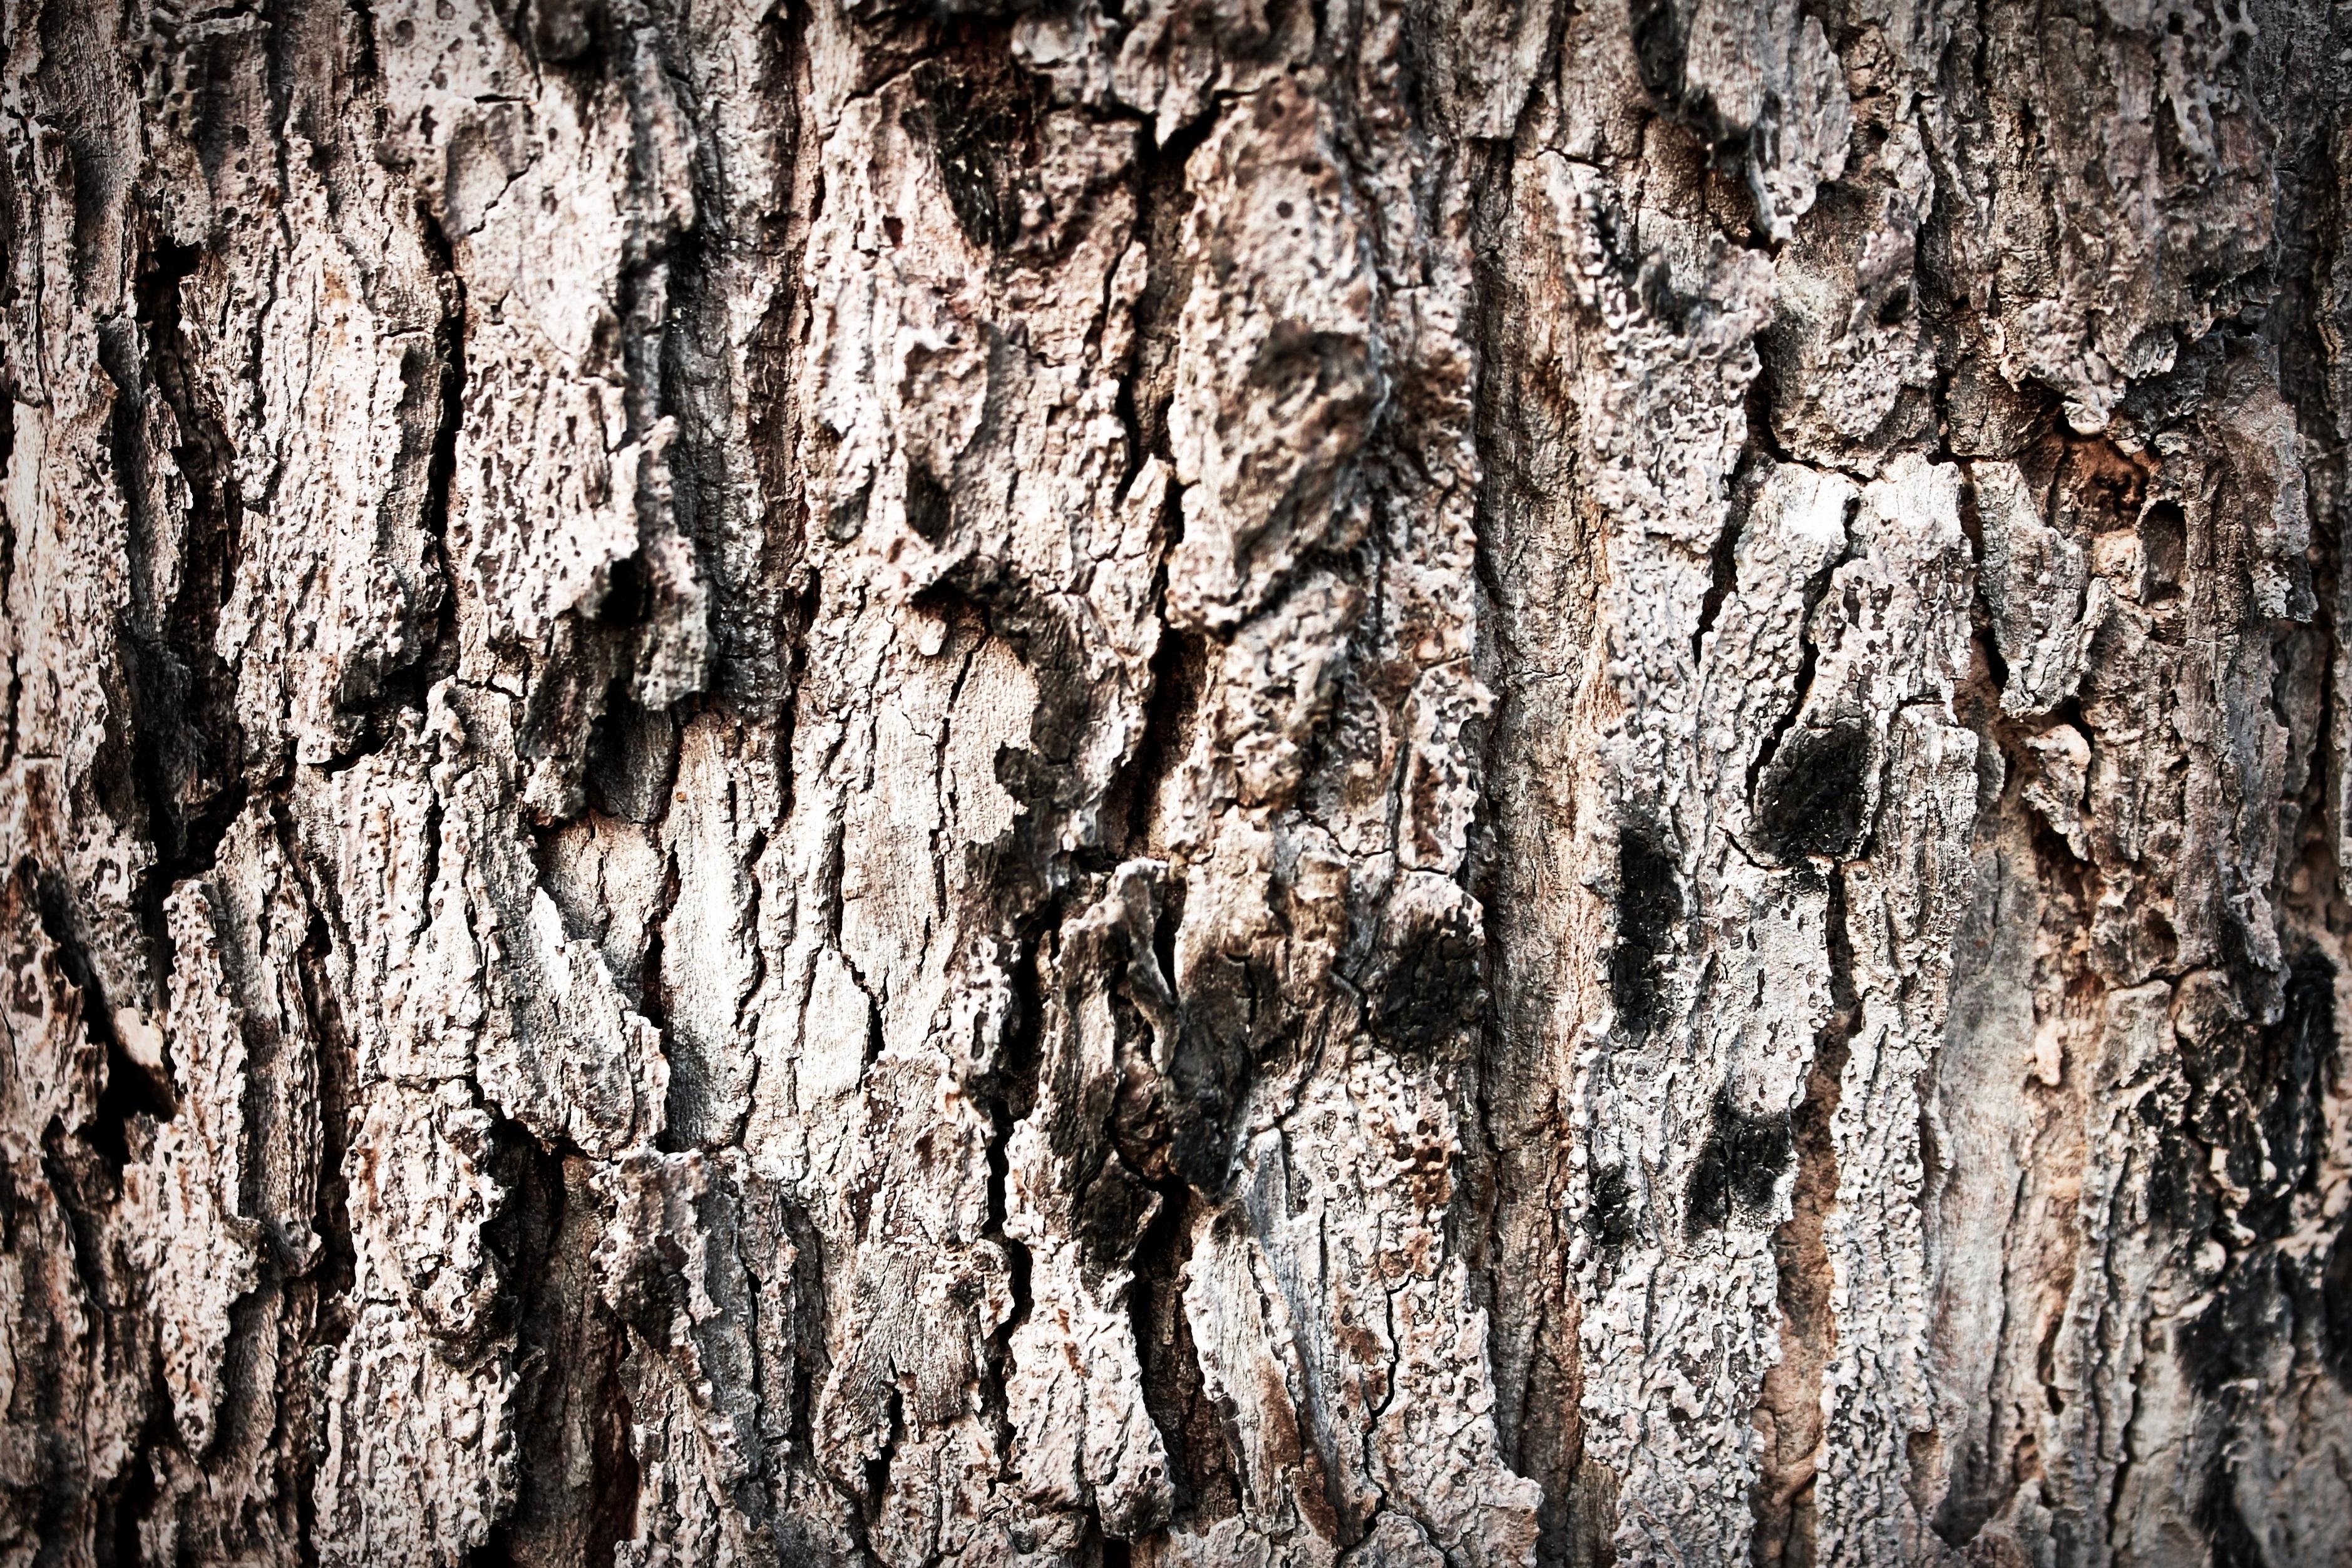 Kostenlose Foto : Baum, Natur, Ast, Holz, Boden, Textur, Blatt, Kofferraum,  Land, Sommer , Bildung, Trocken, Umwelt, Schmutz, Birke, Gebrochen, Riss,  Rau, ...